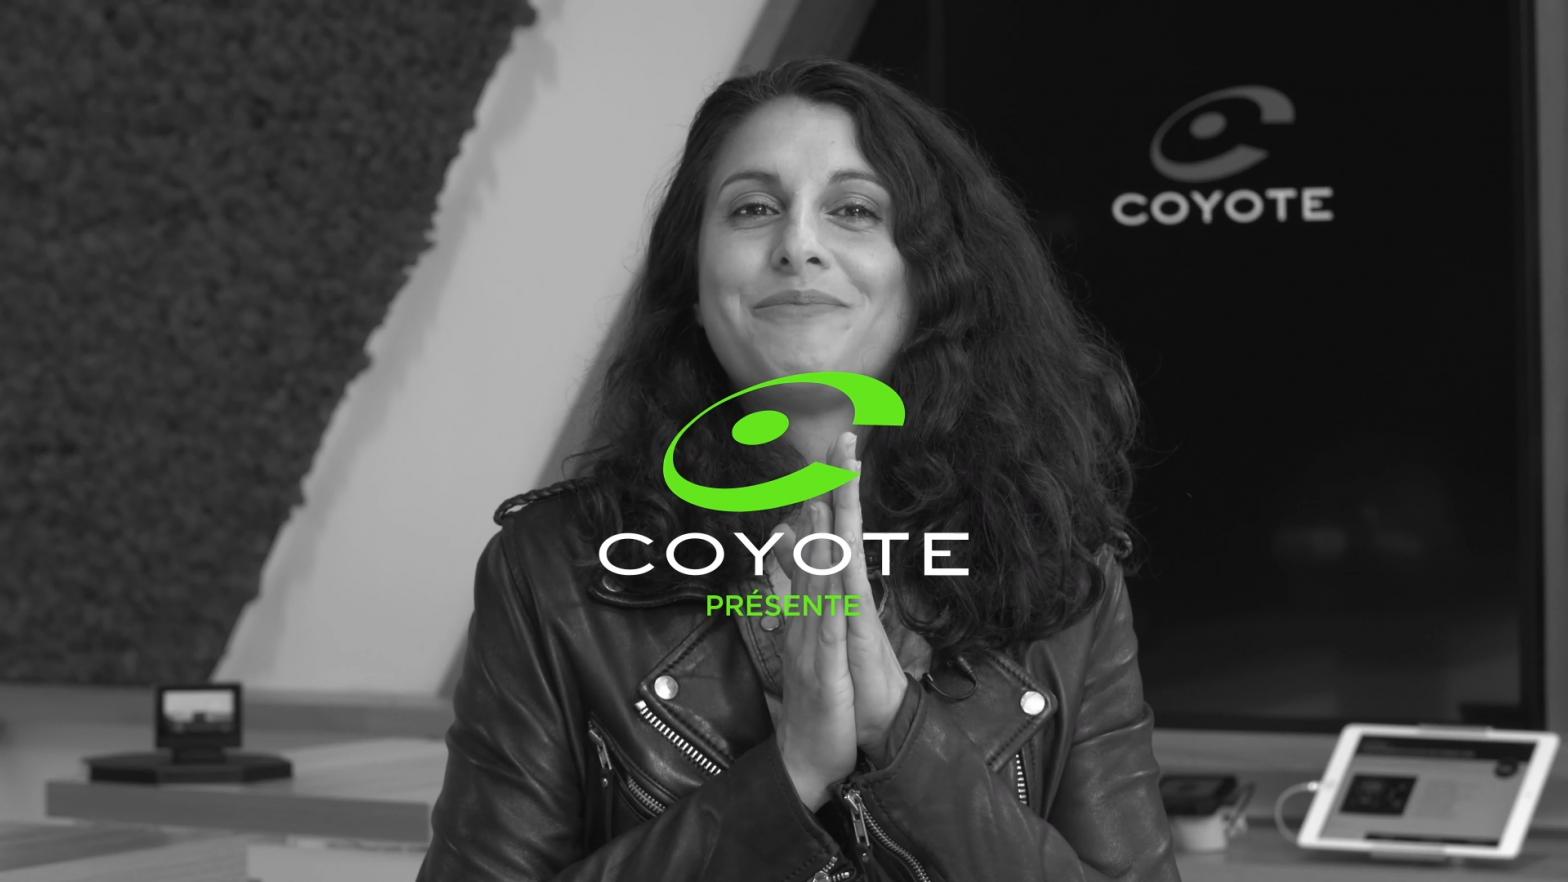 Coyote Ad